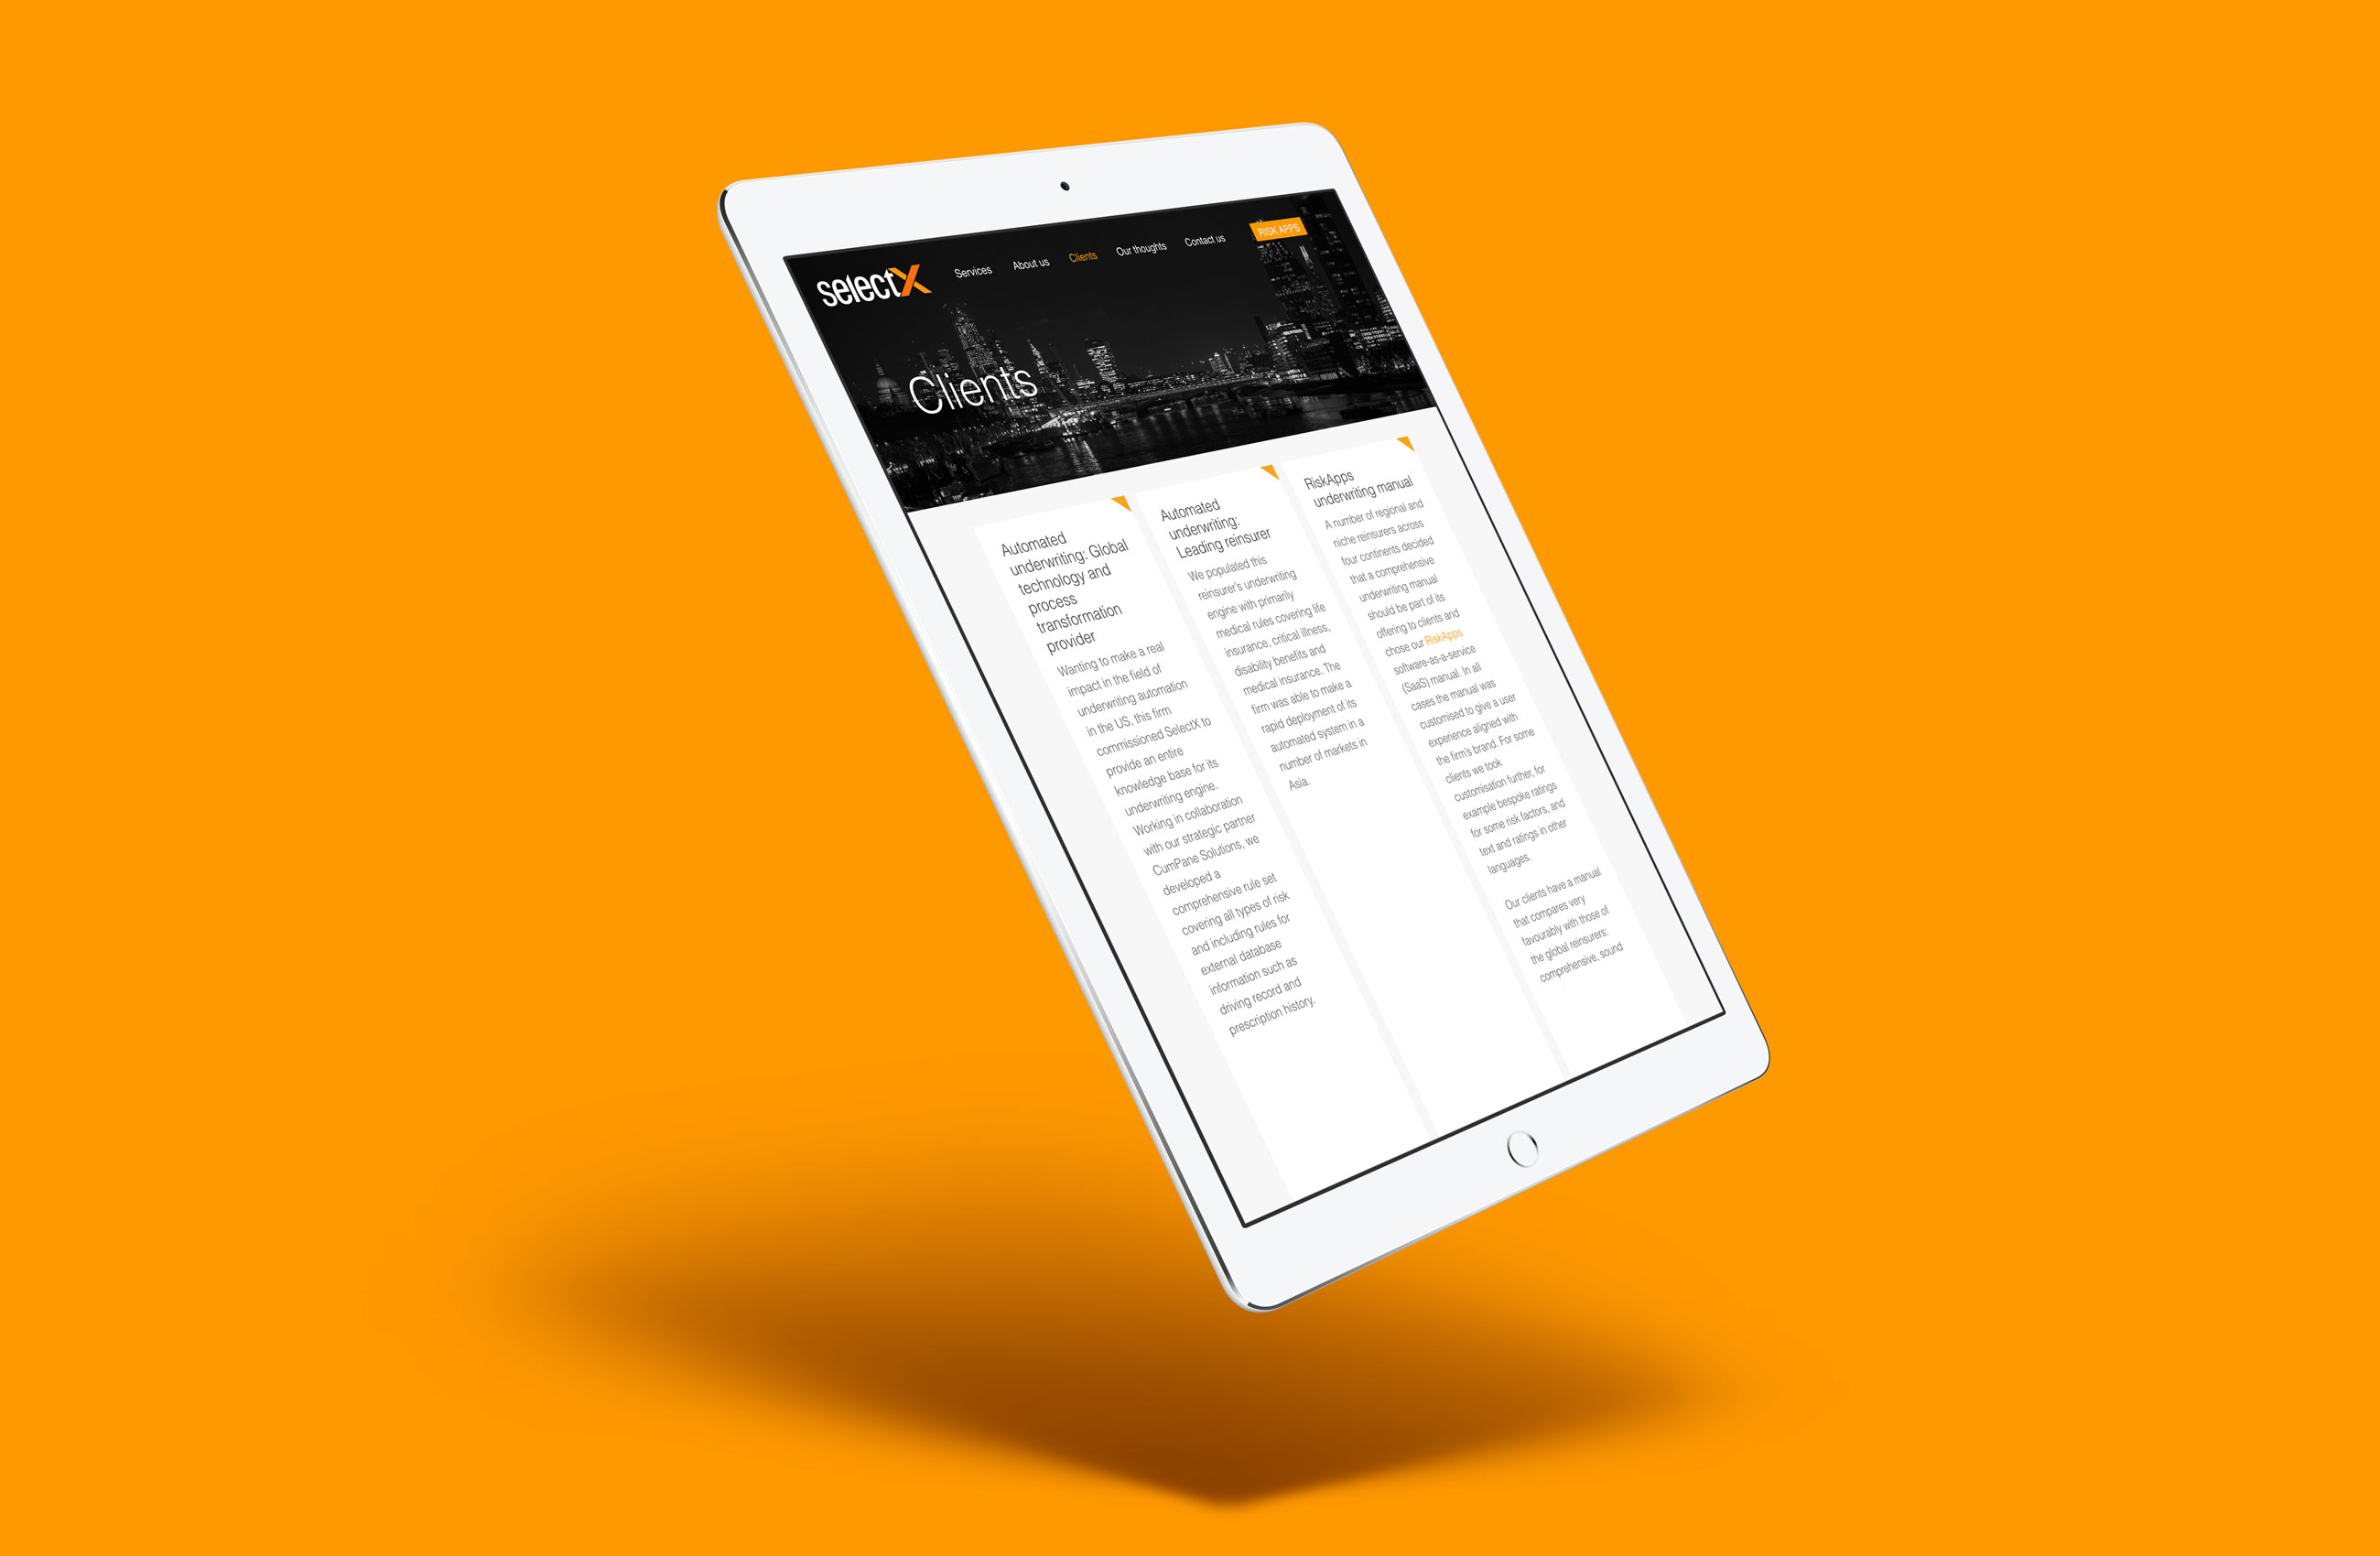 selectx-iPad-portrait